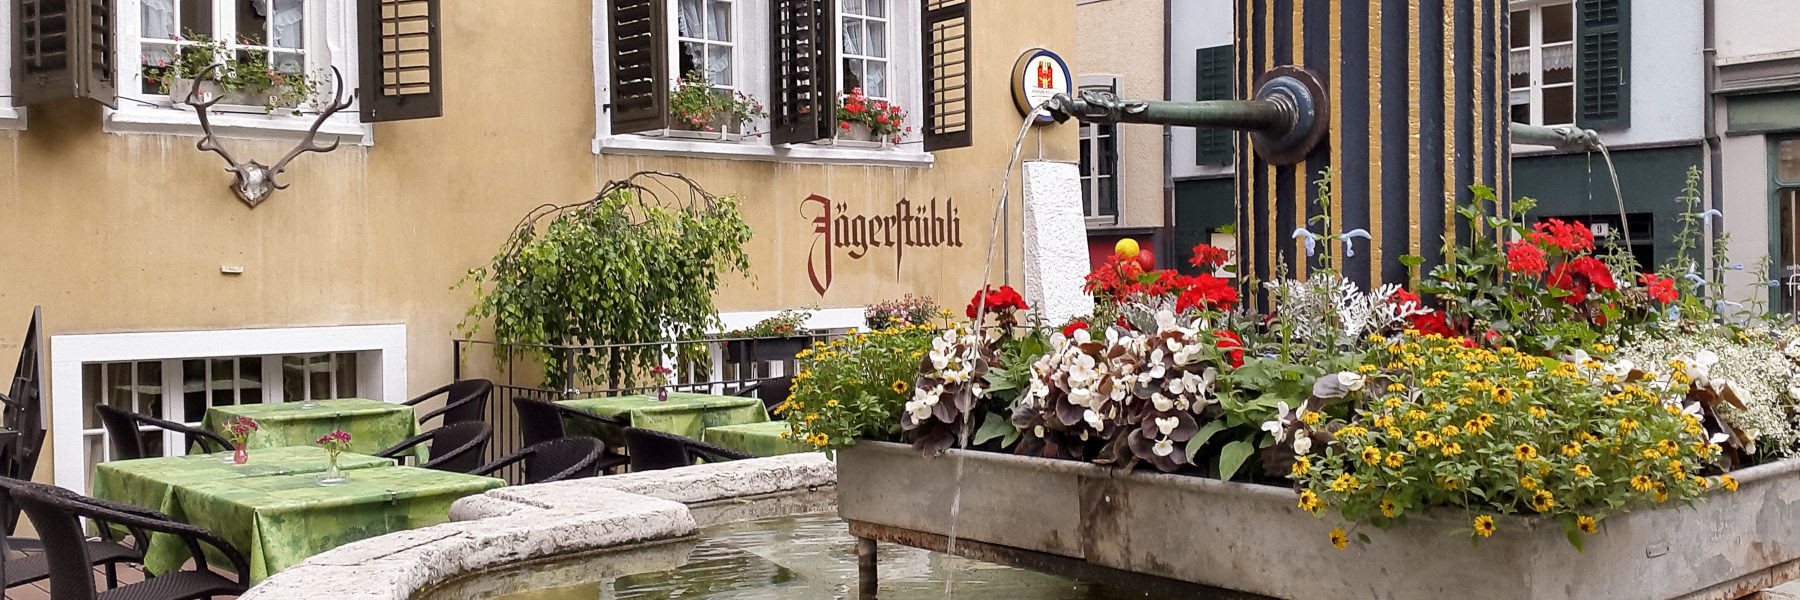 Jägerstübli Solothurn